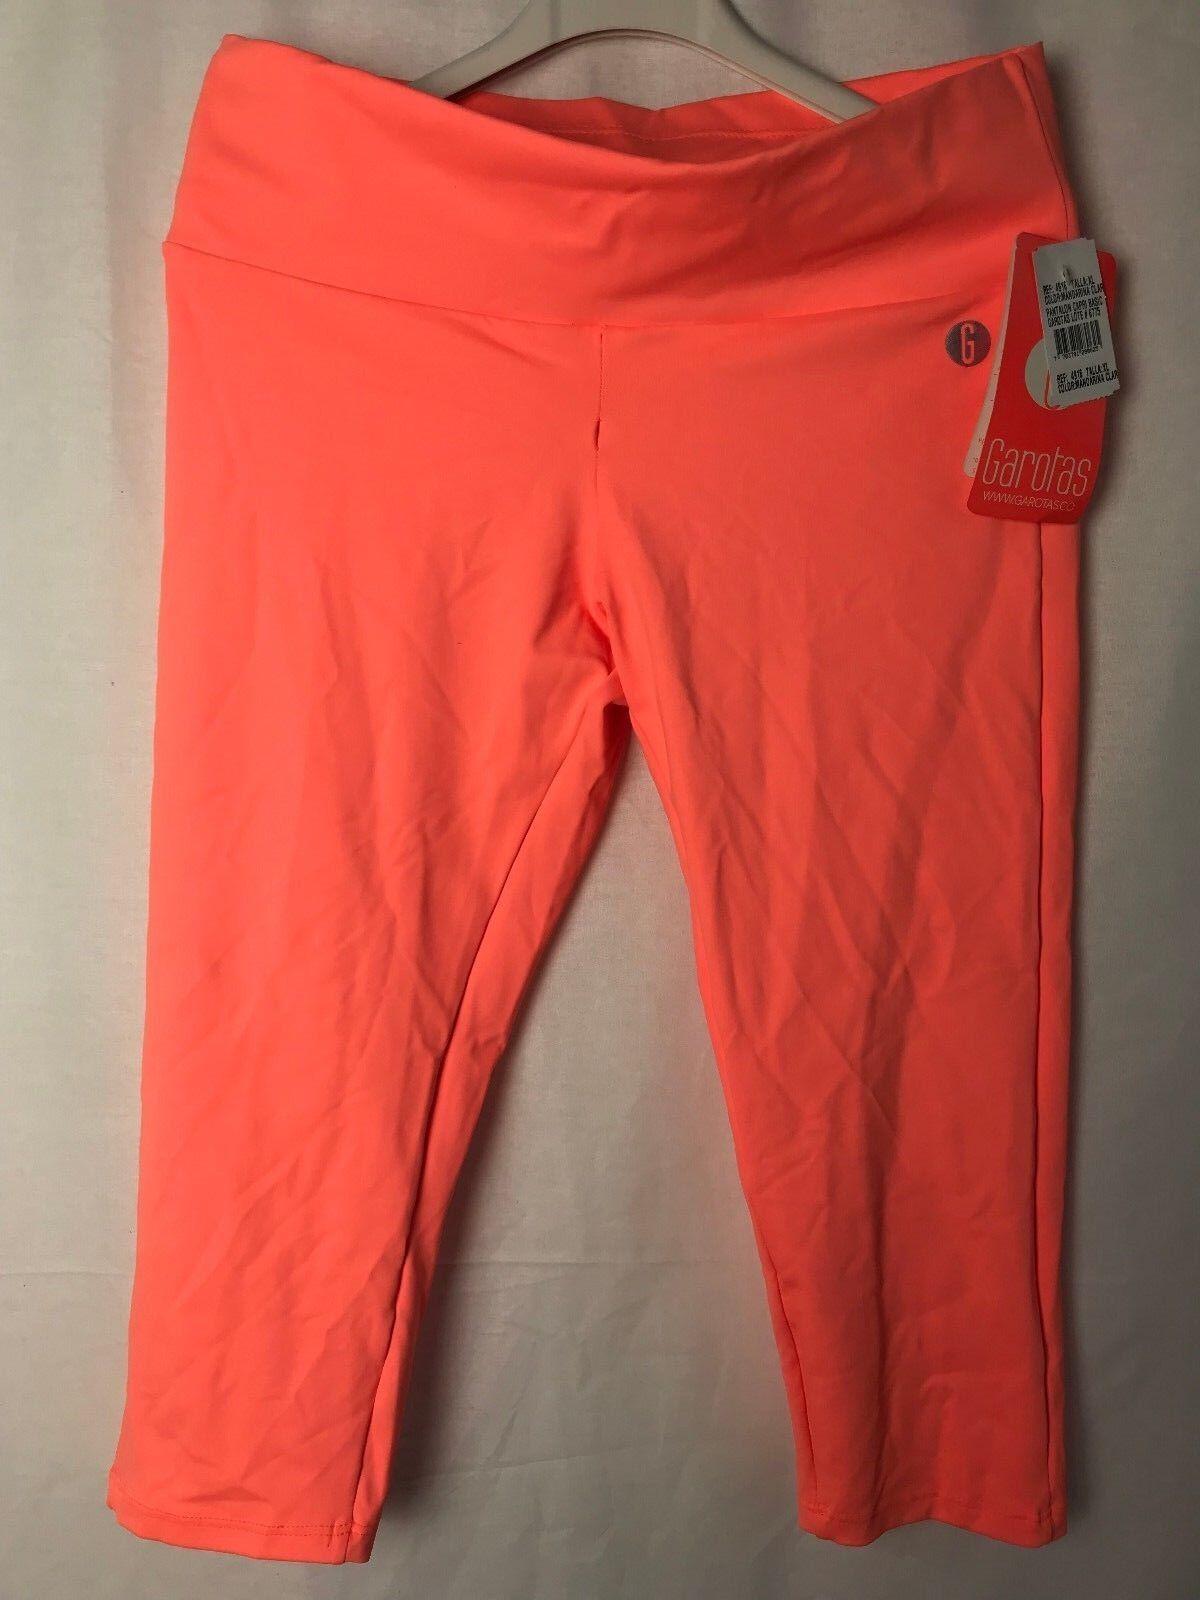 Garotas SEÑORA LEGGINS LEGGINS LEGGINS pantalón naranja talla XL fc354f